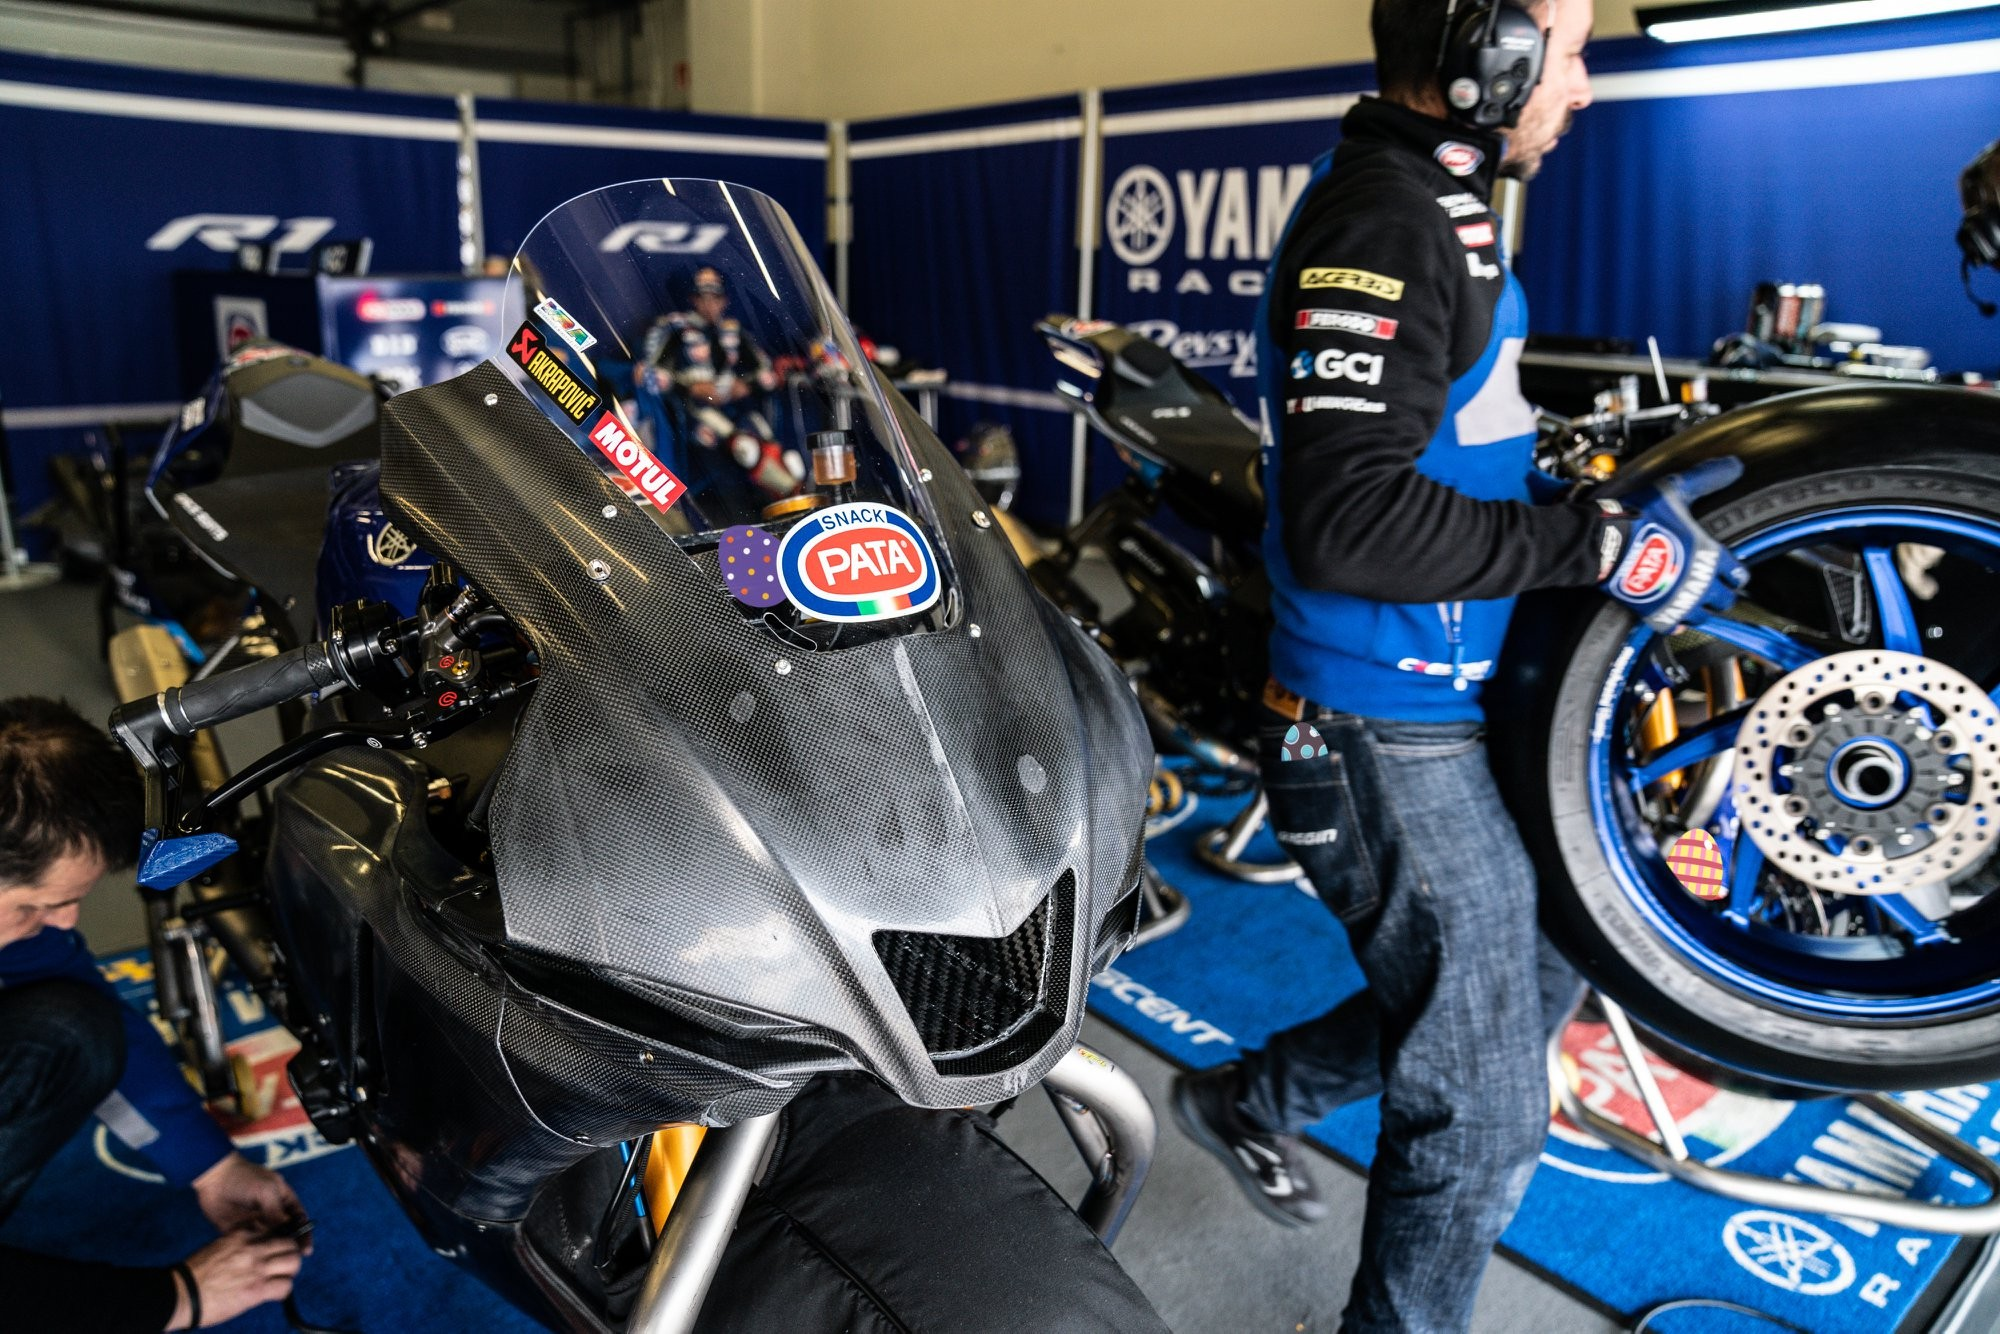 Plastic Bike 2020 Yamaha YZF-R1 Autoclave Carbon Fiber World Superbike Race Bodywork Kit